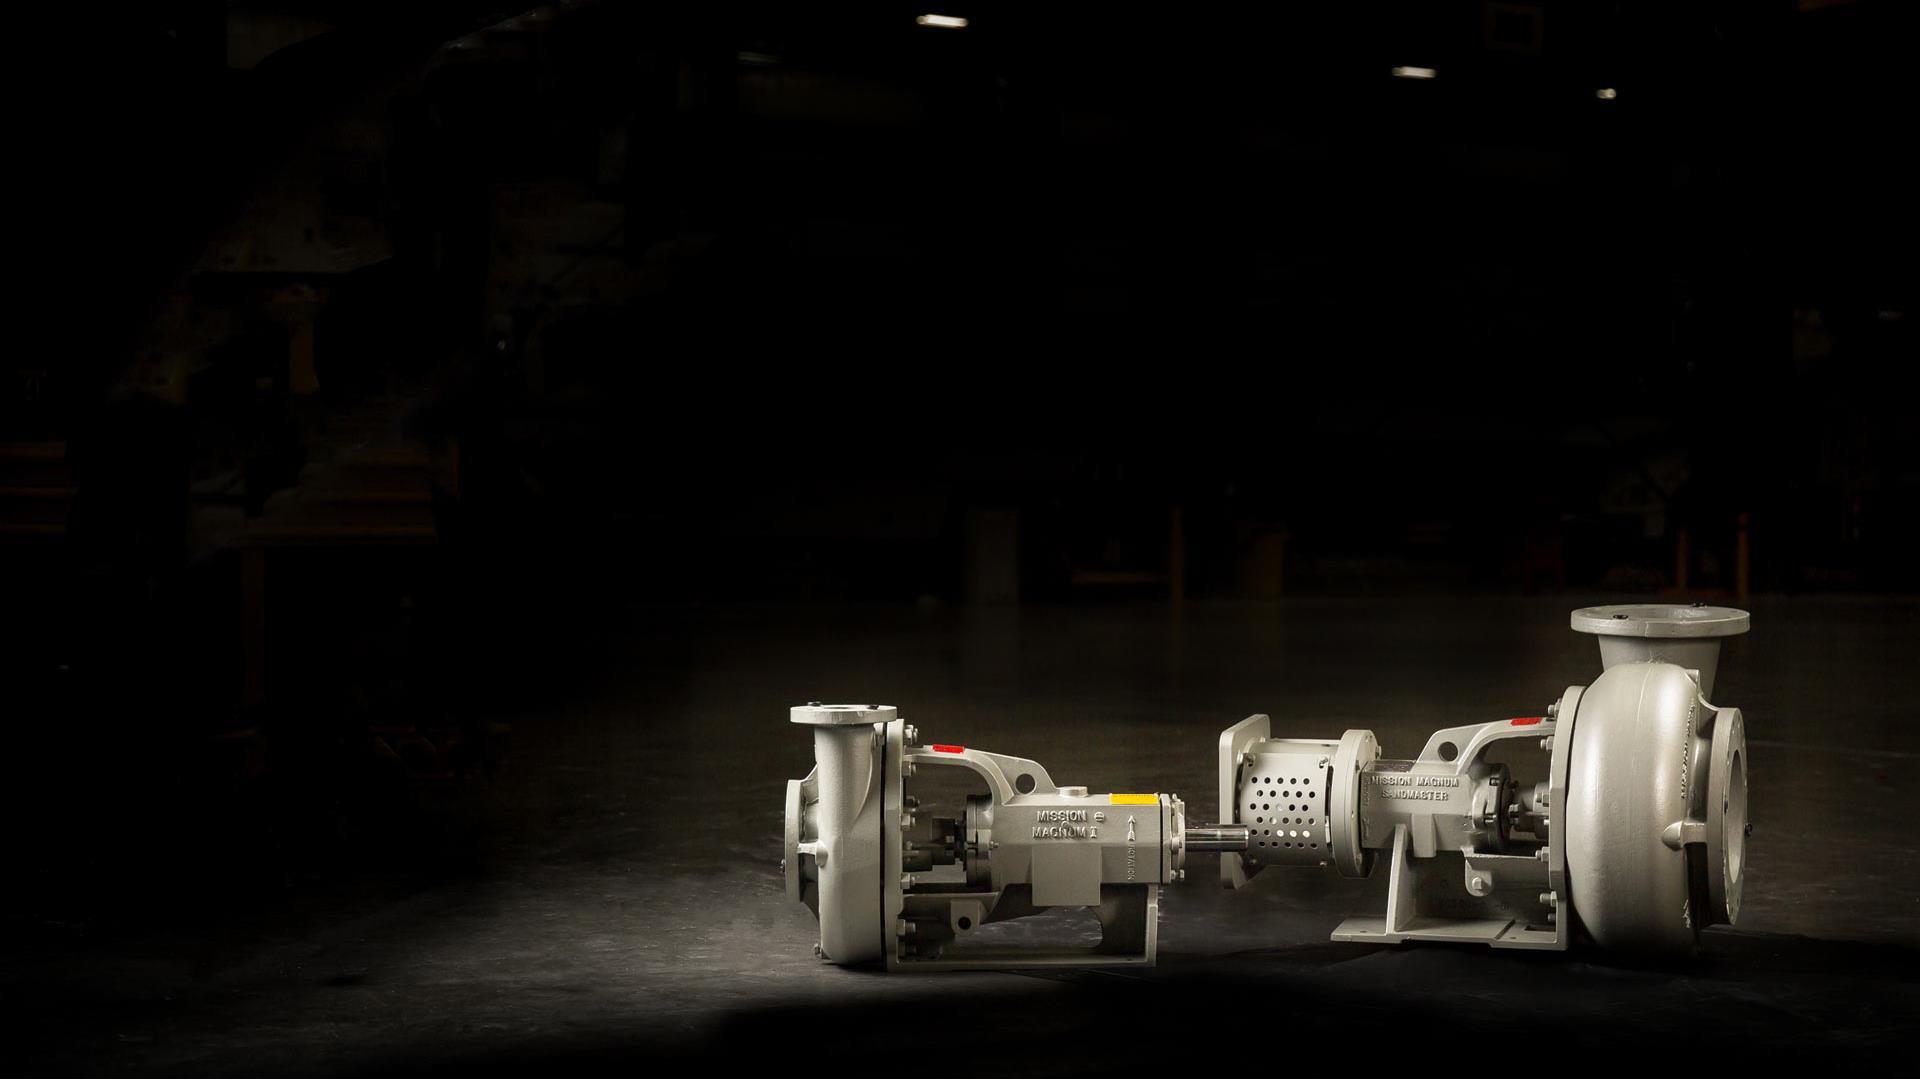 MISSION Sandmaster Centrifugal Pump in empty warehouse